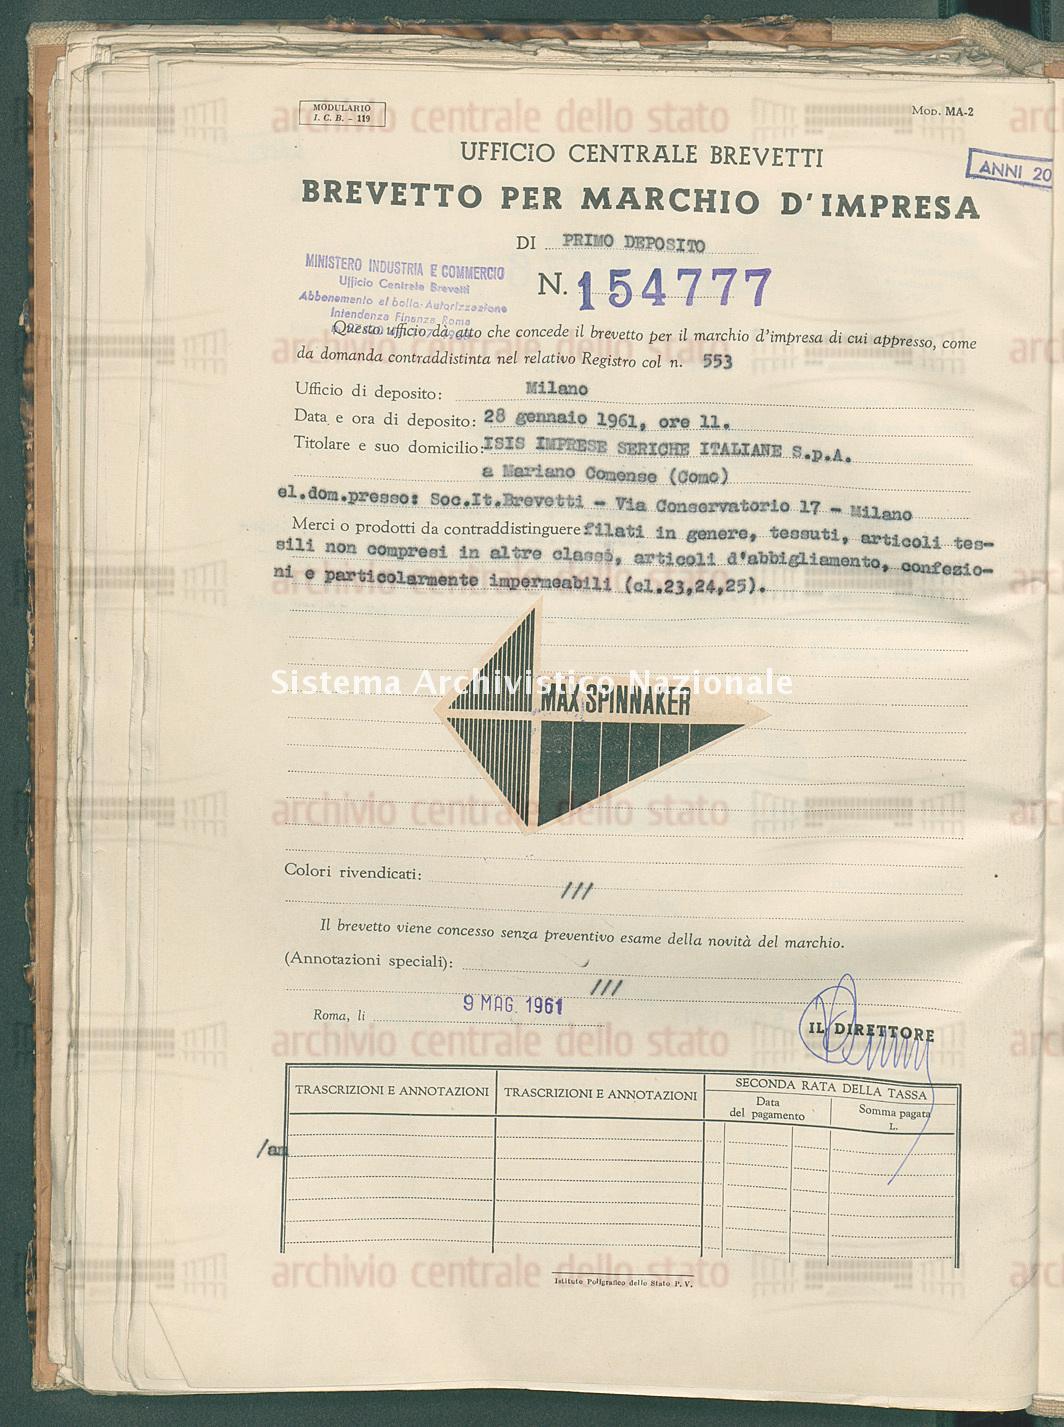 Filati in genere, tessuti ecc. Isis Imprese Seriche Italiane S.P.A. (09/05/1961)